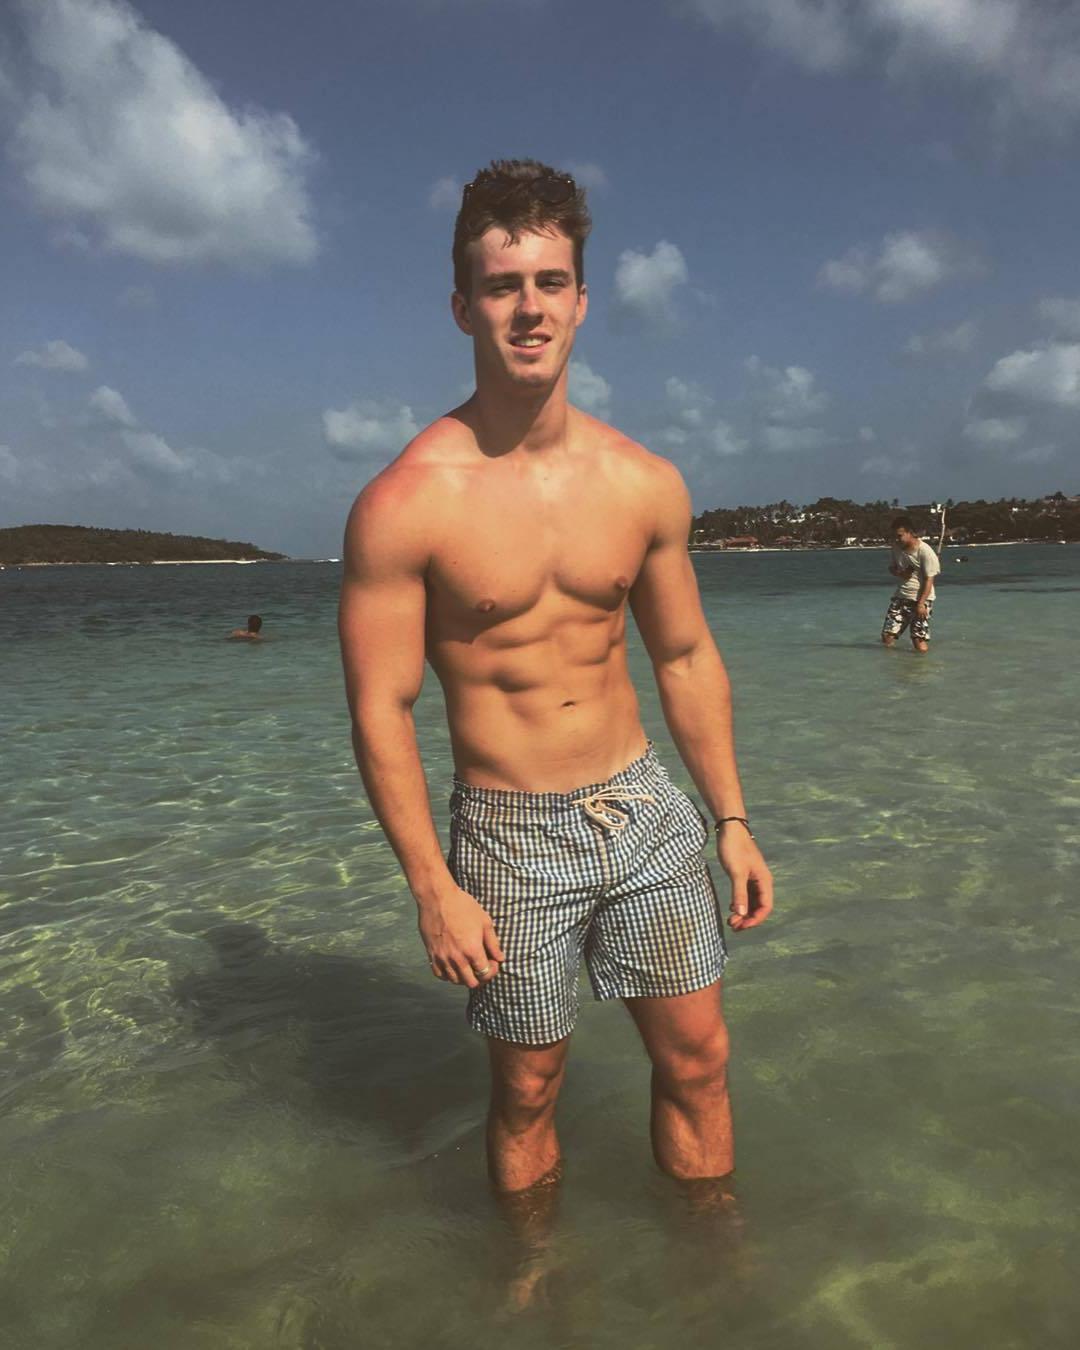 long-hot-summertime-guys-fit-shirtless-body